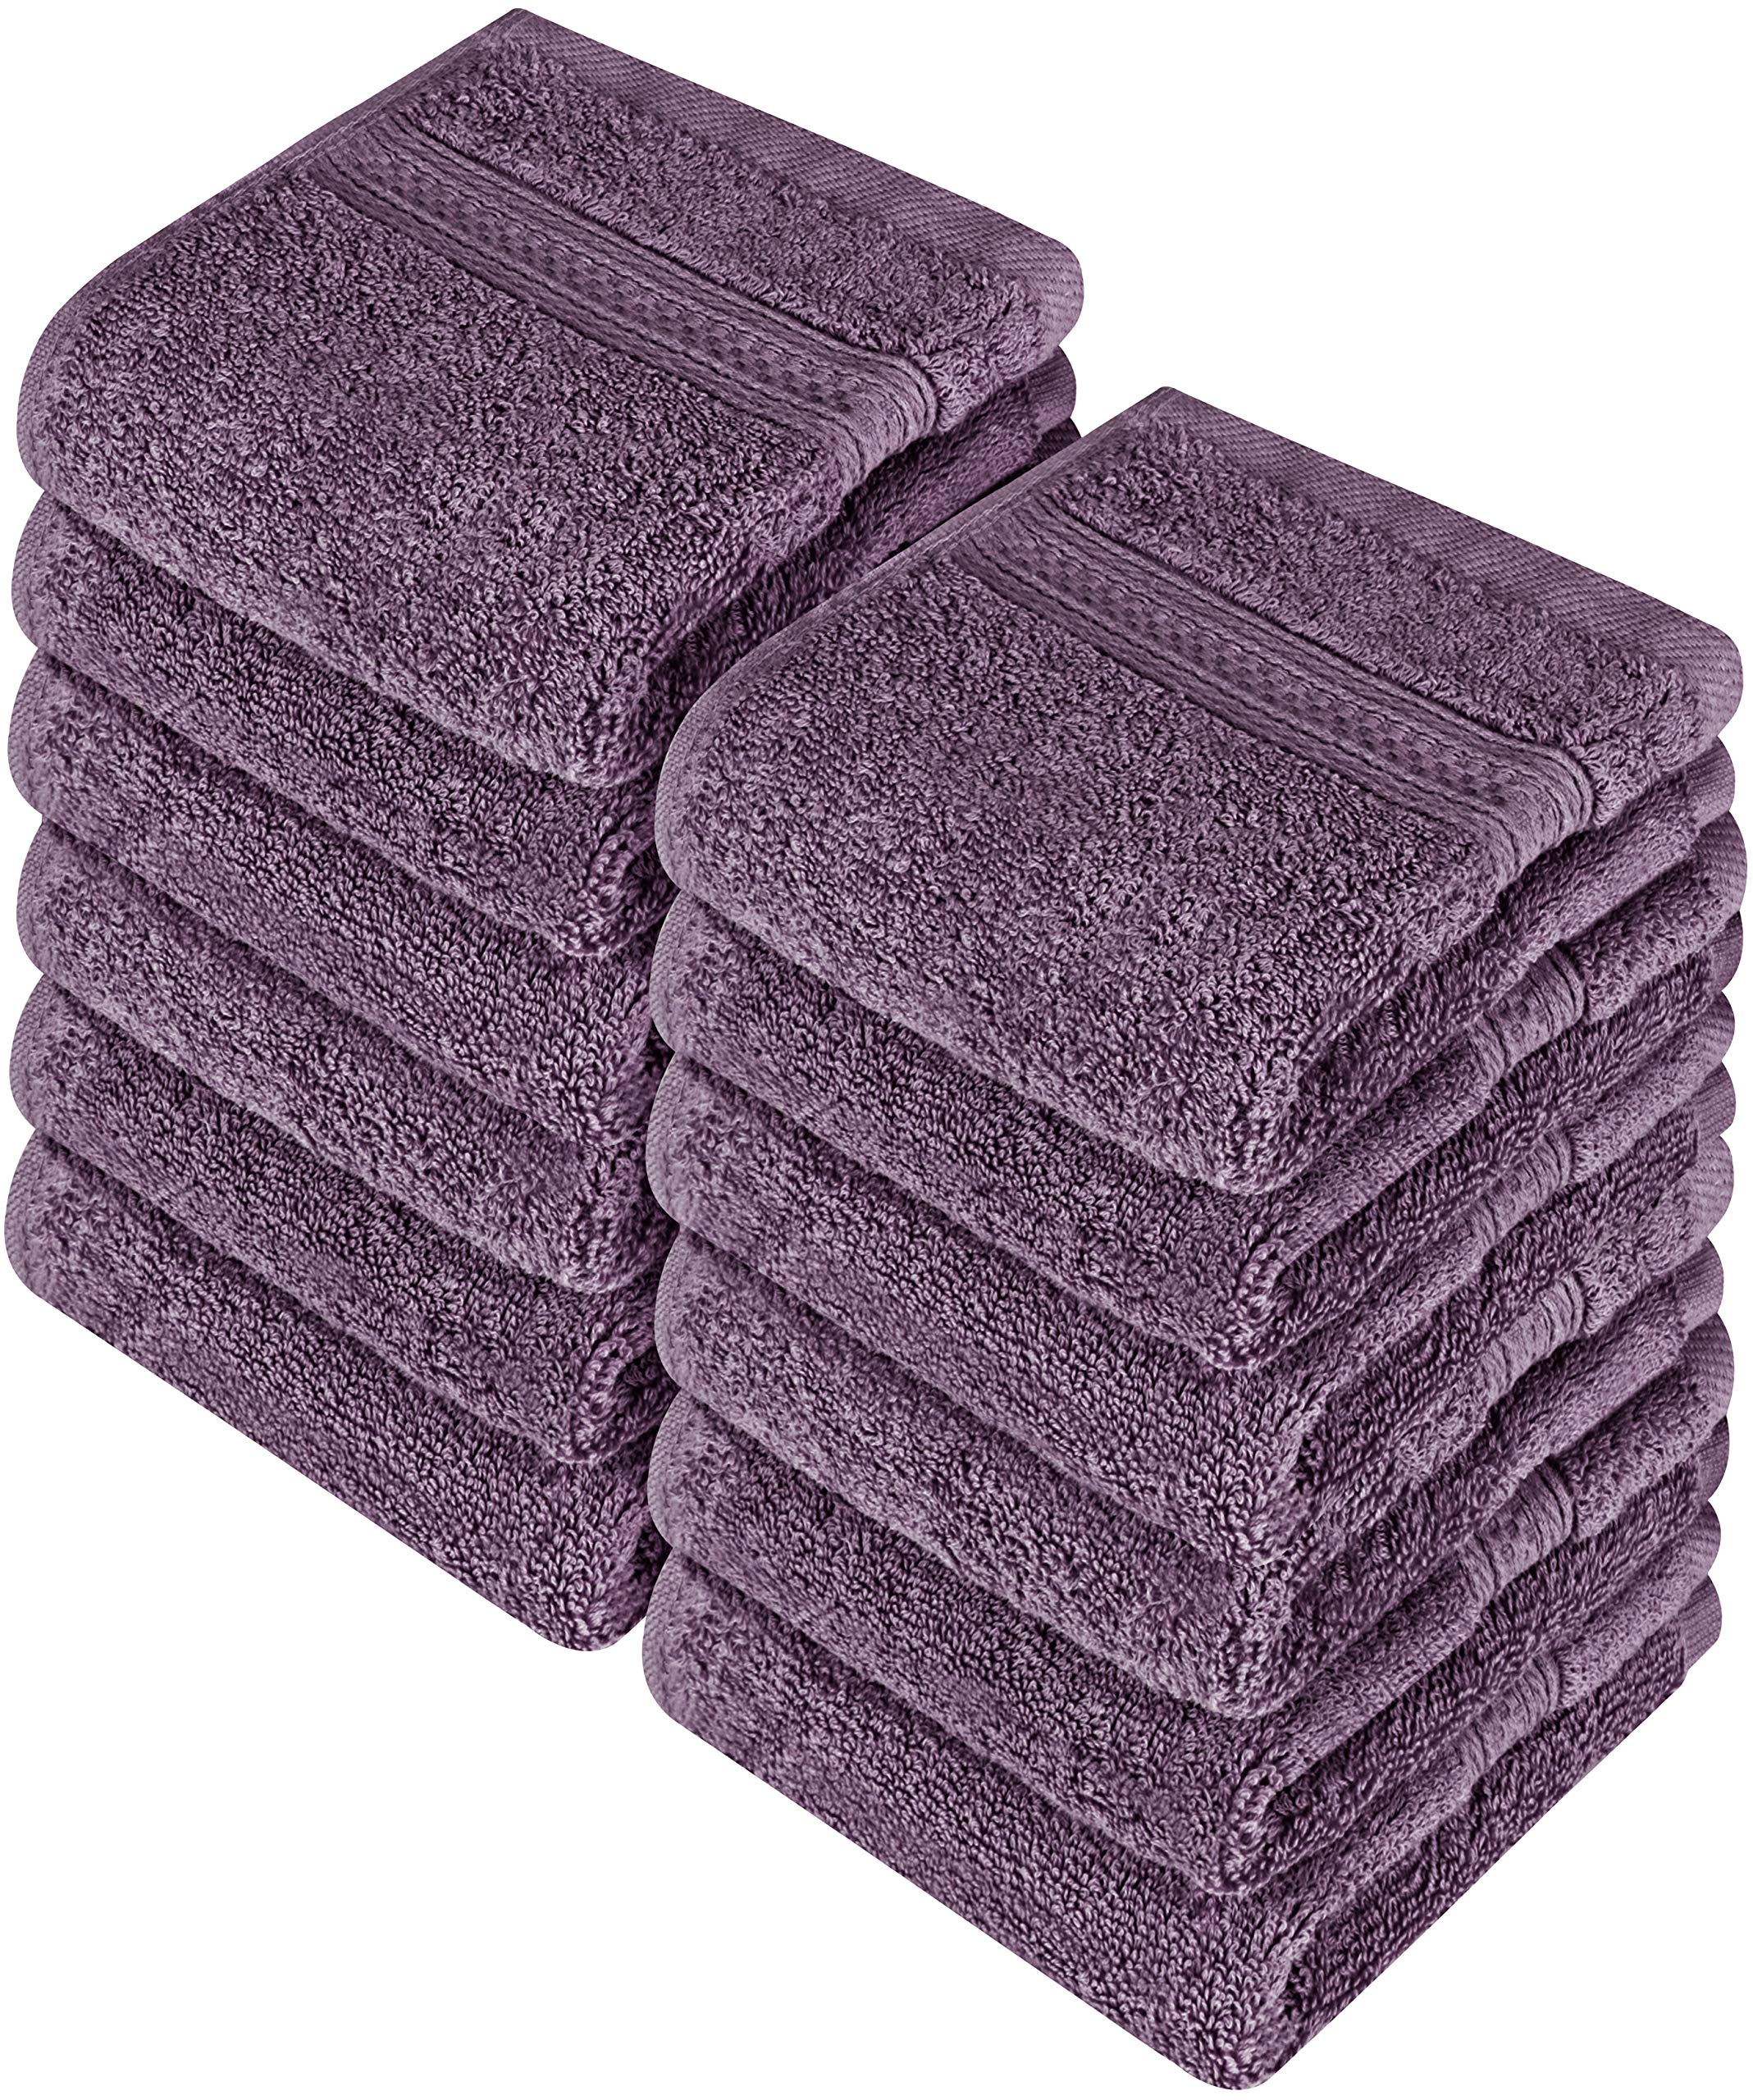 Utopia Towels Premium 252 Pack 700 GSM Cotton Washcloths Bulk– (12 x 12 Inches Face Towels Bulk) Extra Soft Wash Cloths, Plum